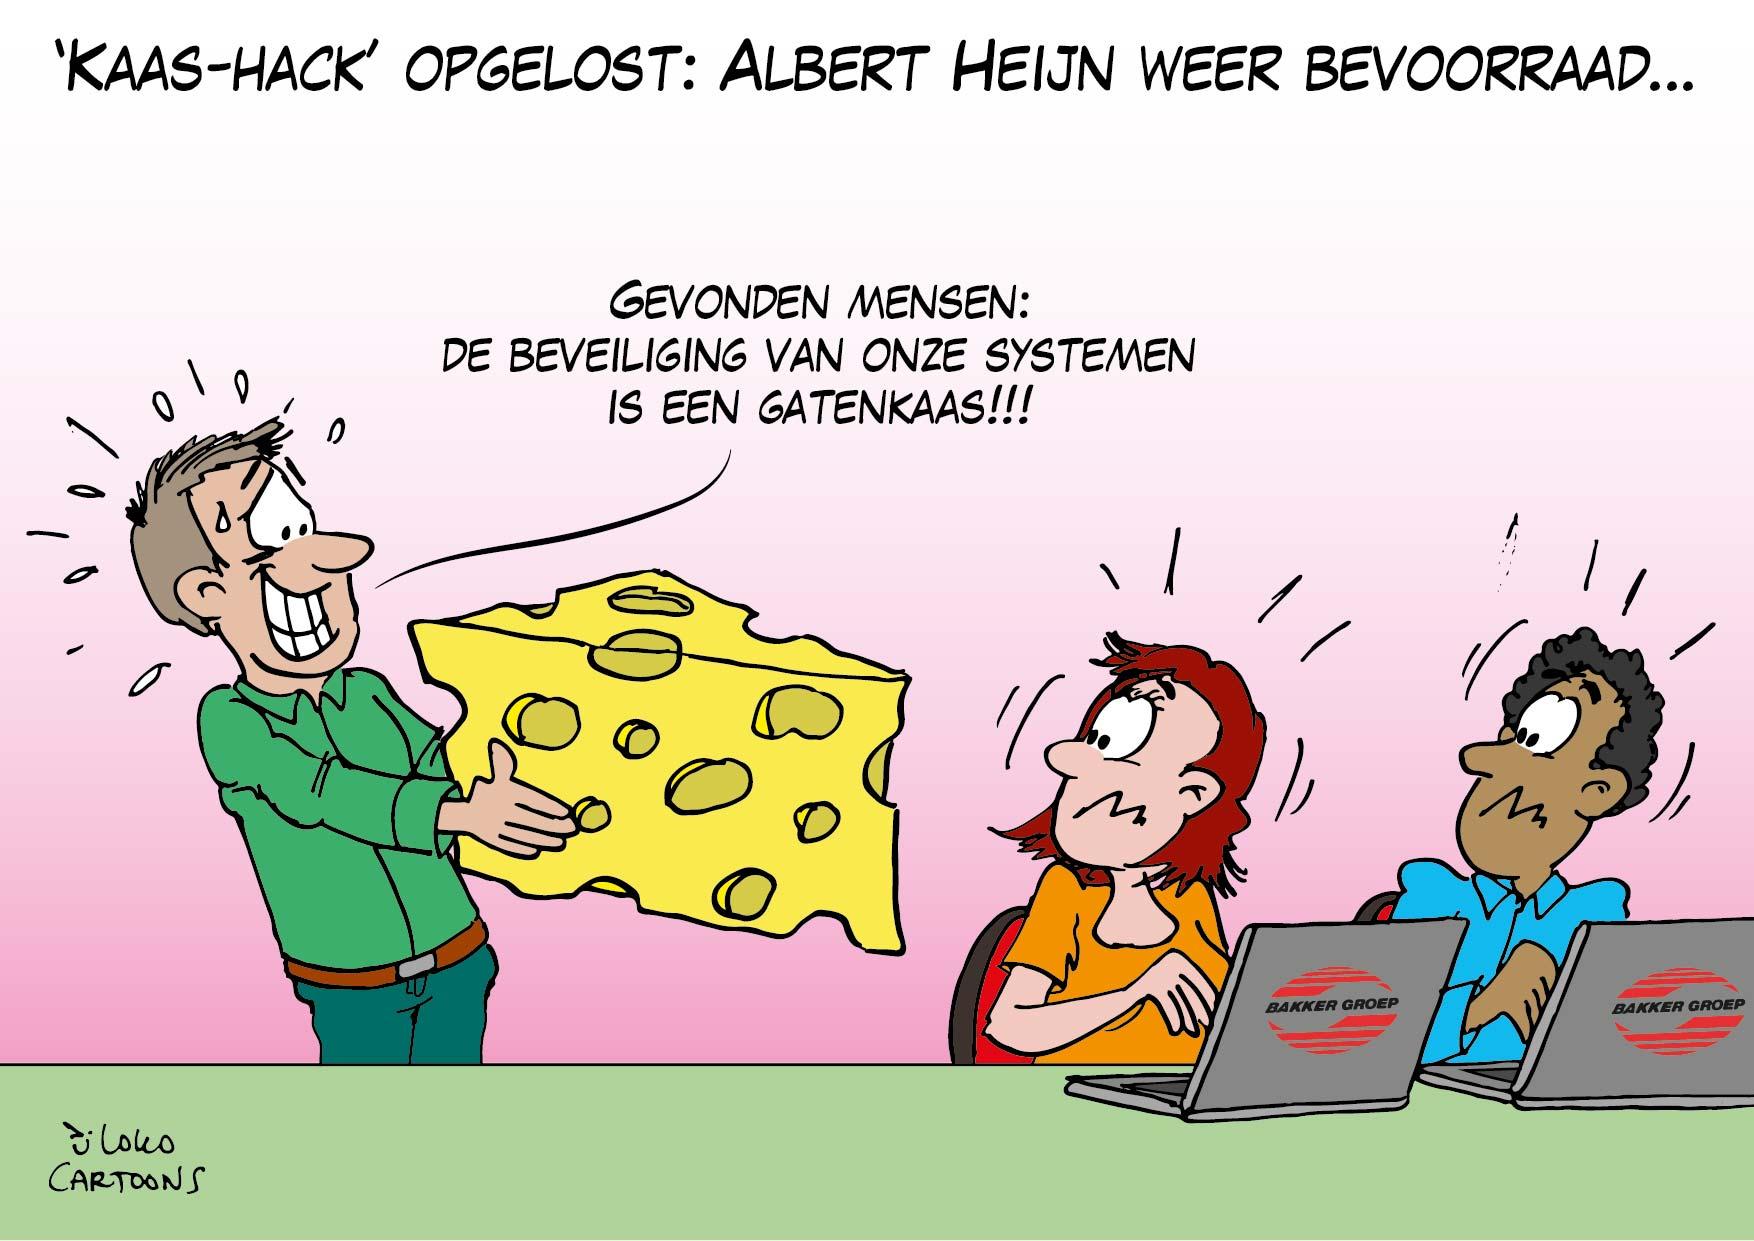 'Kaas-hack' opgelost: Albert Heijn weer bevoorraad…